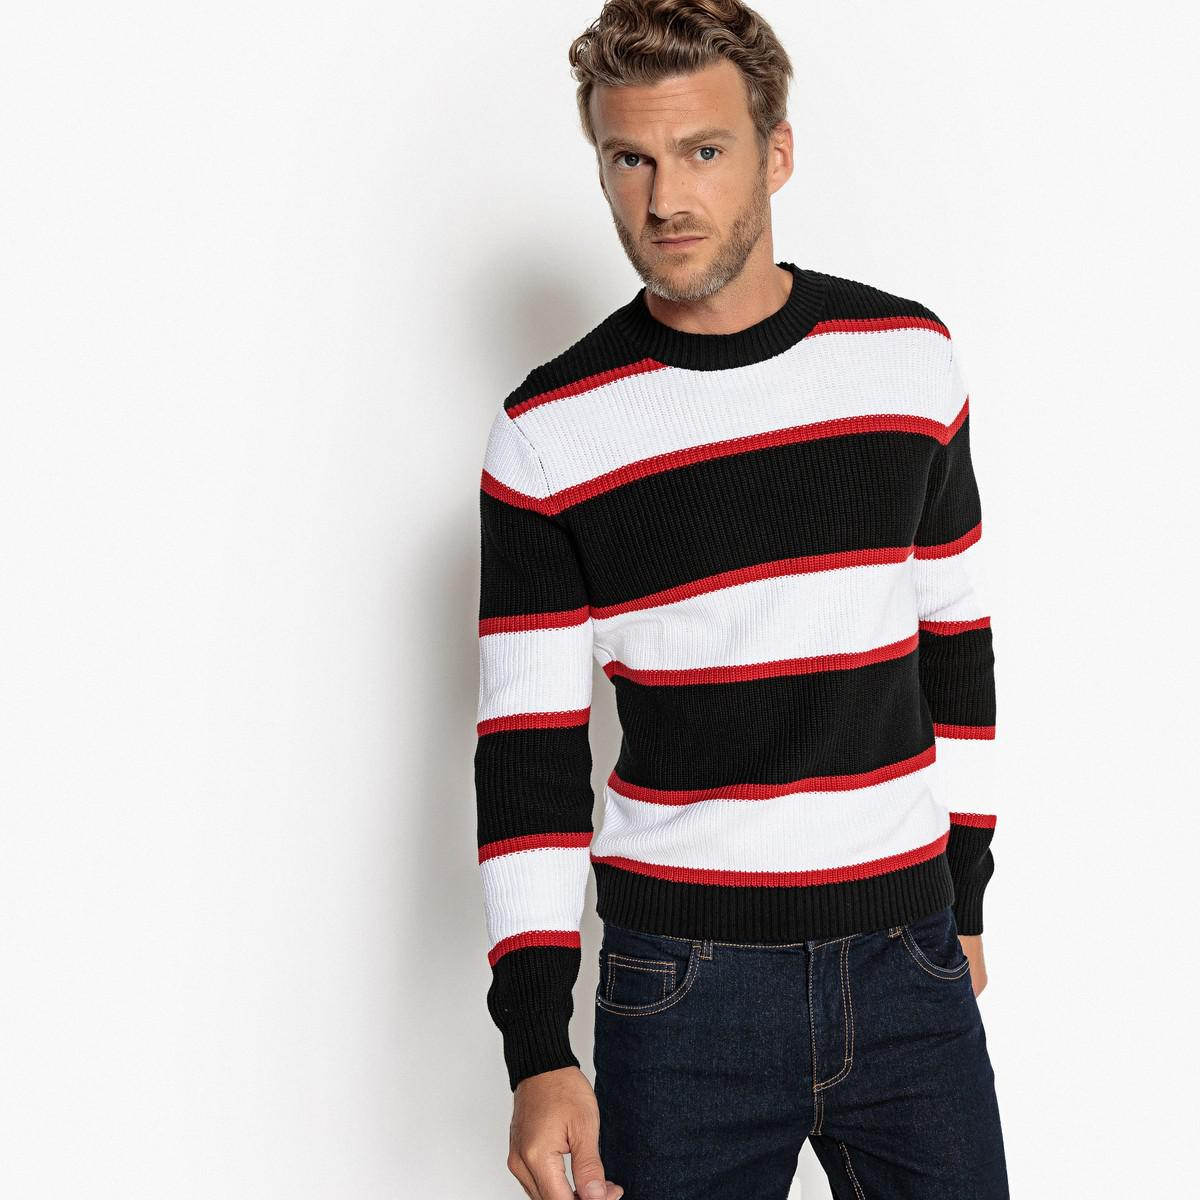 Qiangjinjiu Men Casual Round Neck Slim Fit Long Sleeve Pullover Sweaters